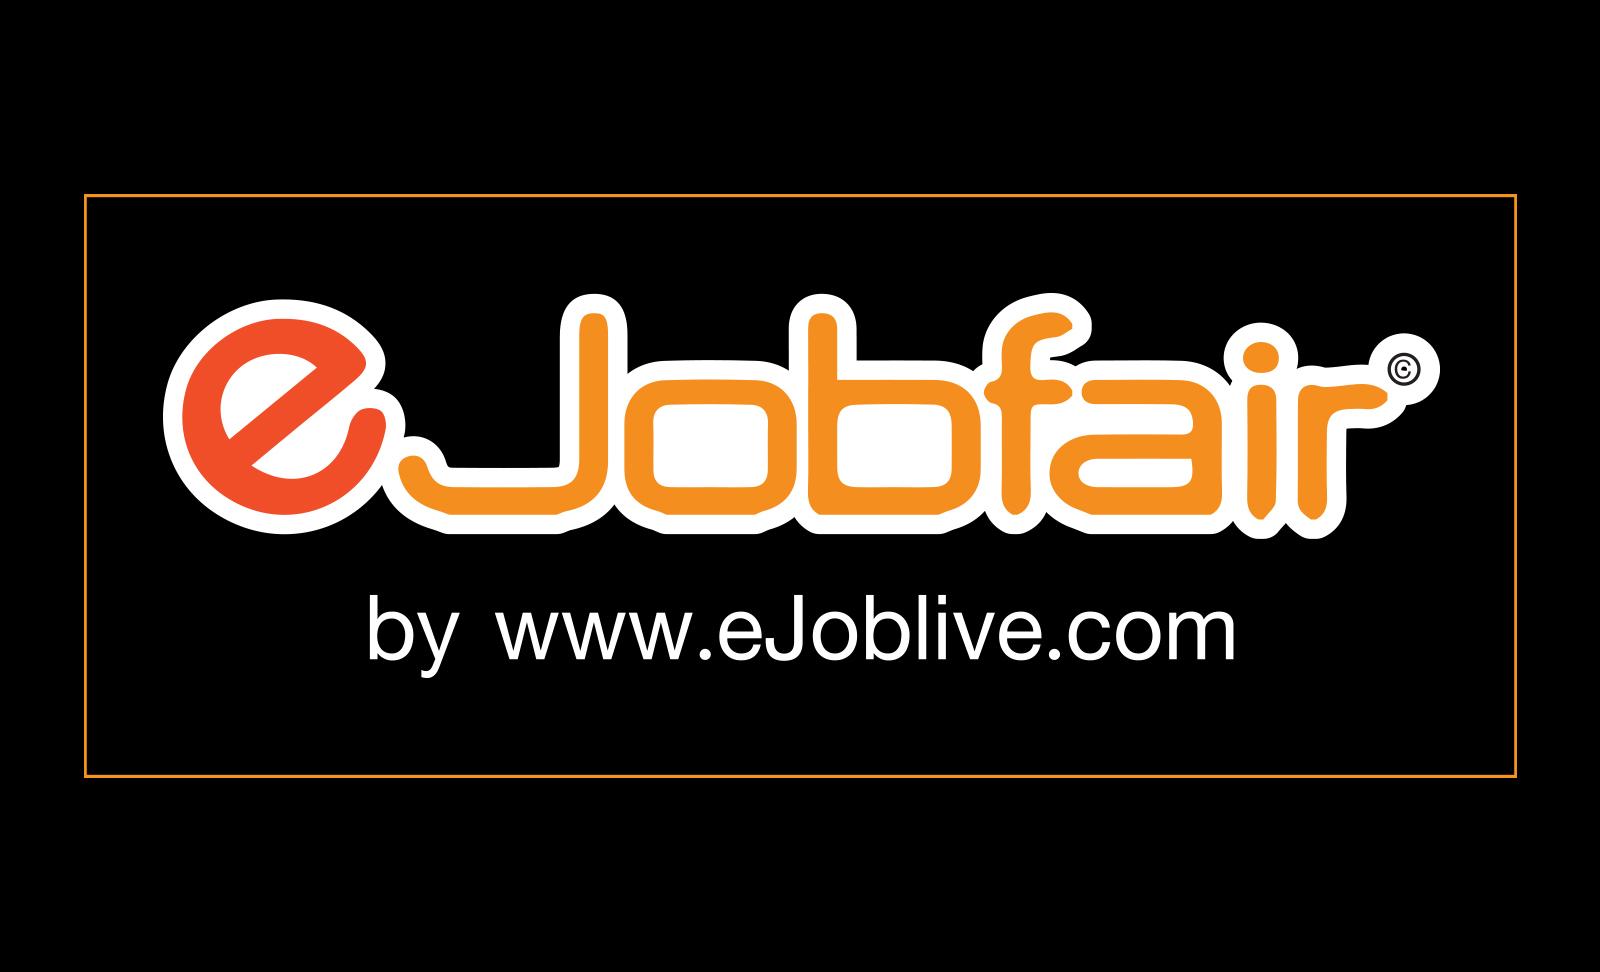 e-jobfair